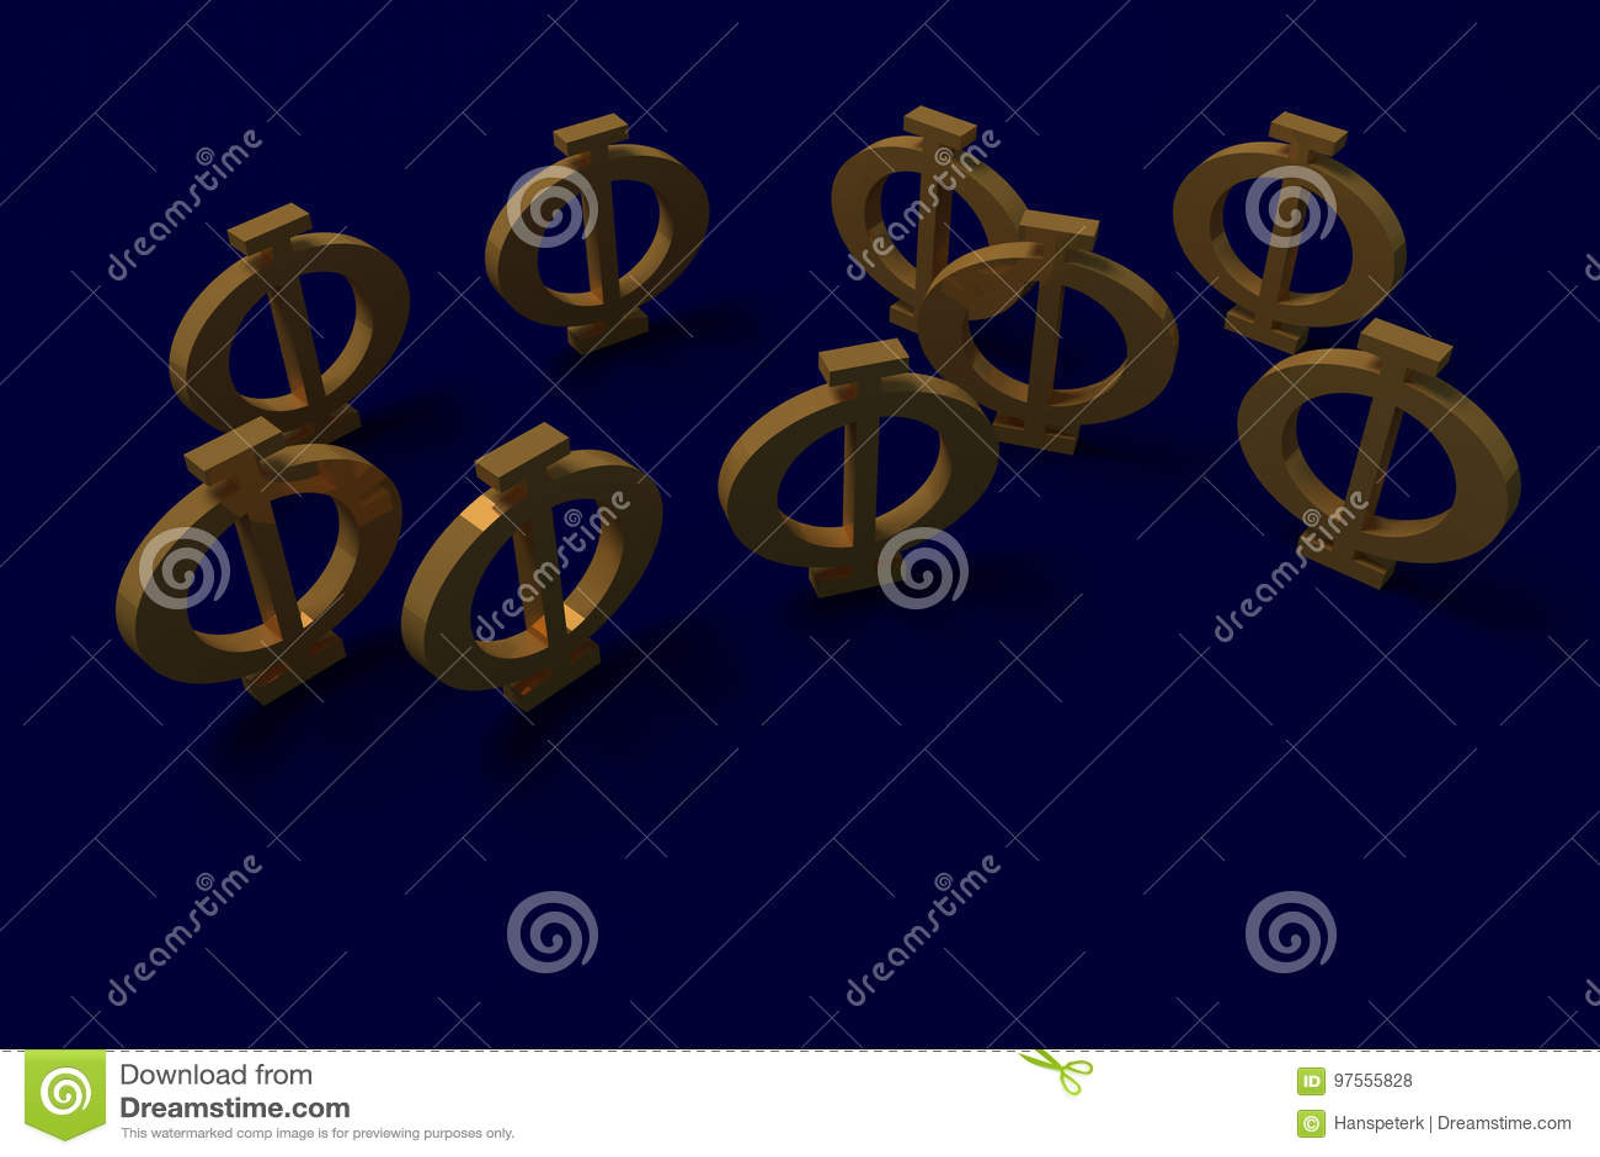 3d Rendering Of A Greek Capital Phi Letter Stock Illustration